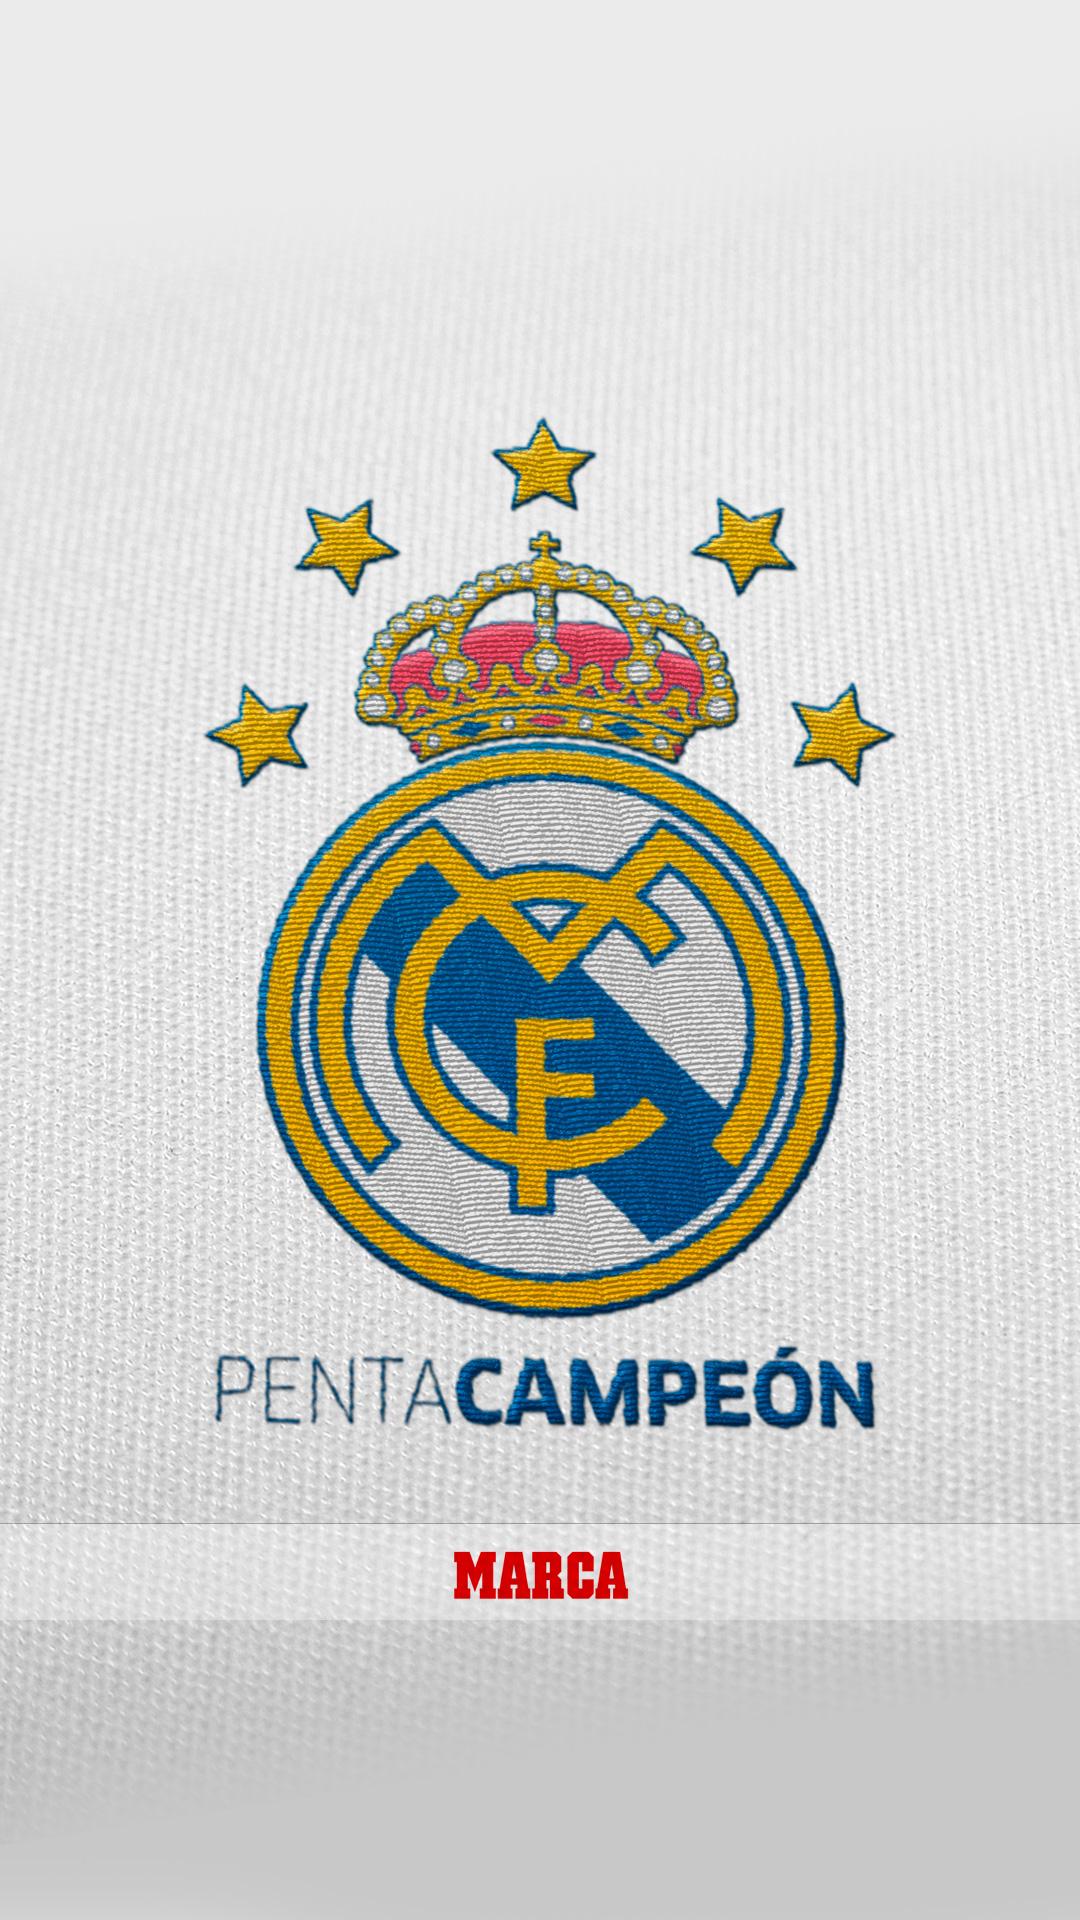 Descárgate en tu móvil el fondo del Madrid pentacampeón del mundo ... e16501a7e2e14